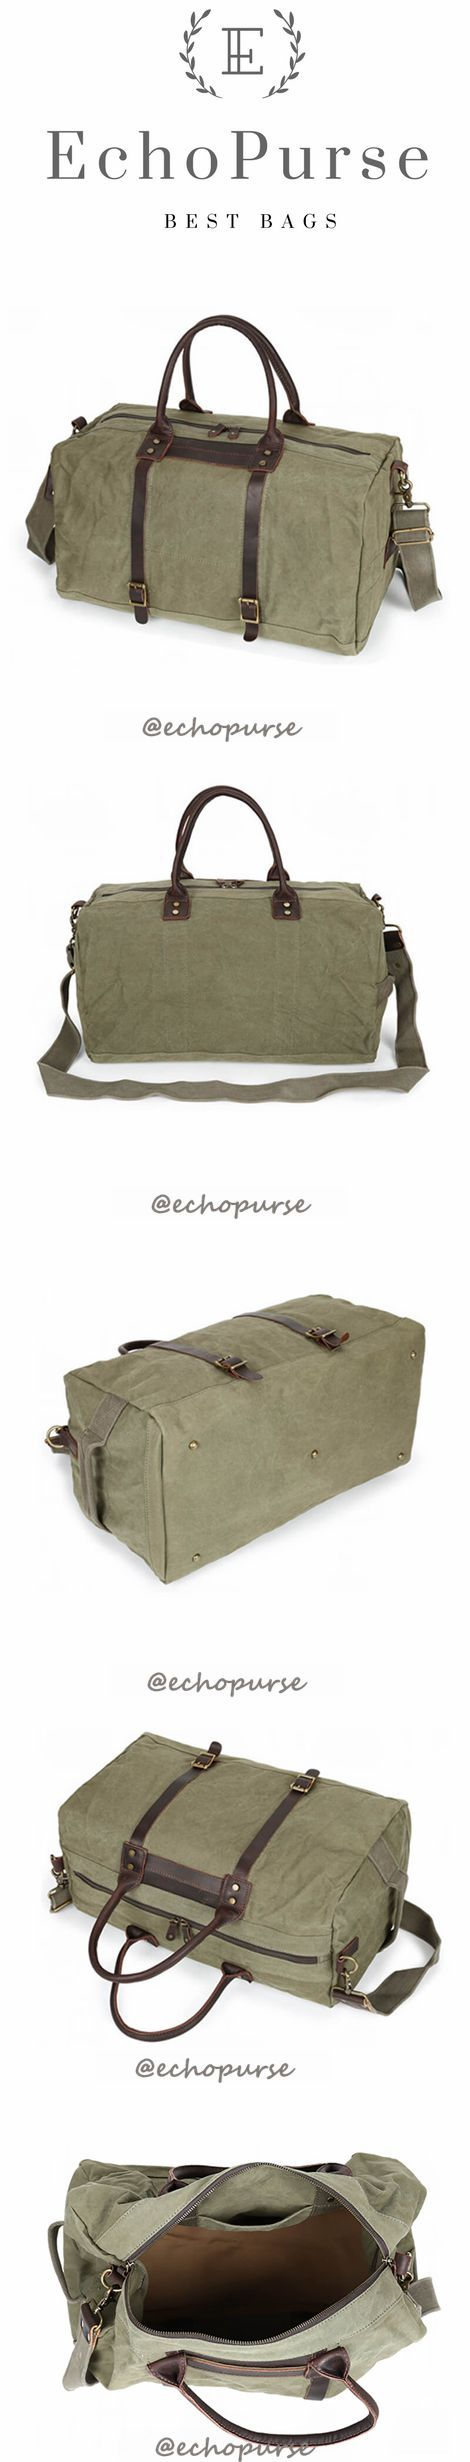 Canvas Duffel Bag, Vintage Travel Handbag, Army Green Waterproof Holdall YD189